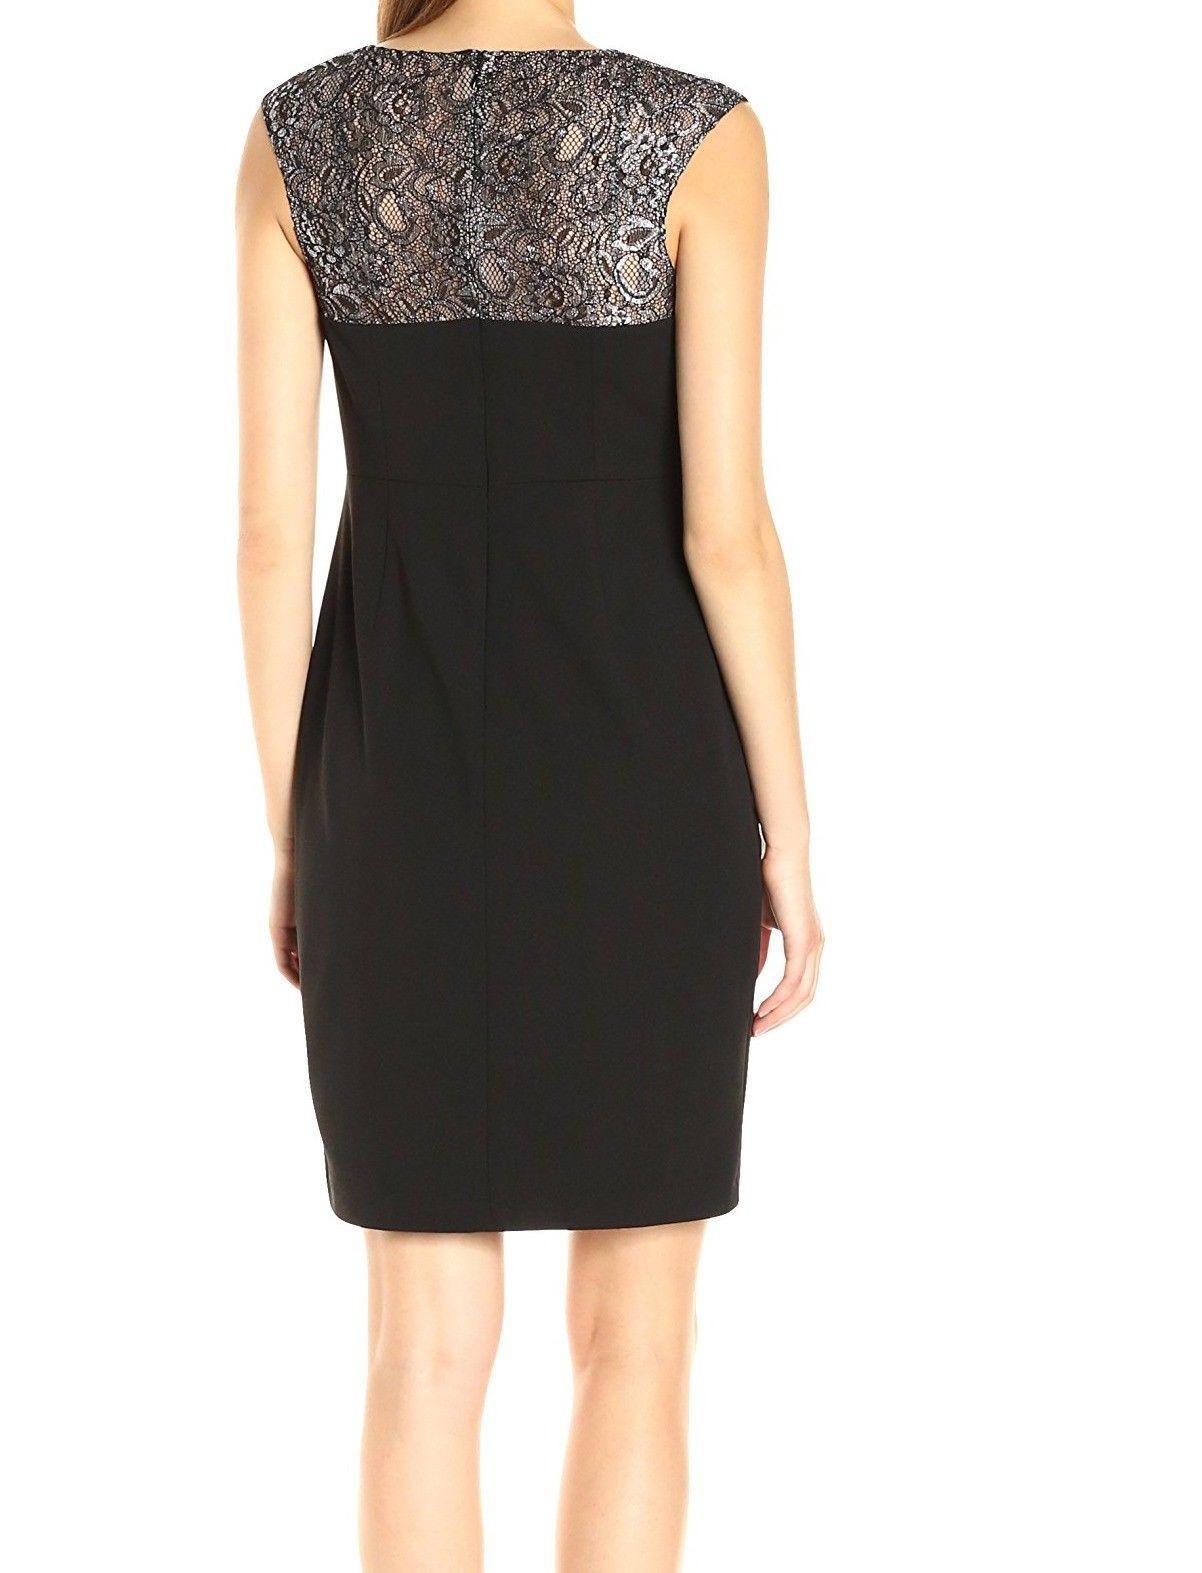 6bfd5b0ff58 Calvin Klein pitsiga bodycon kleit - Kleidid - Naiste riided